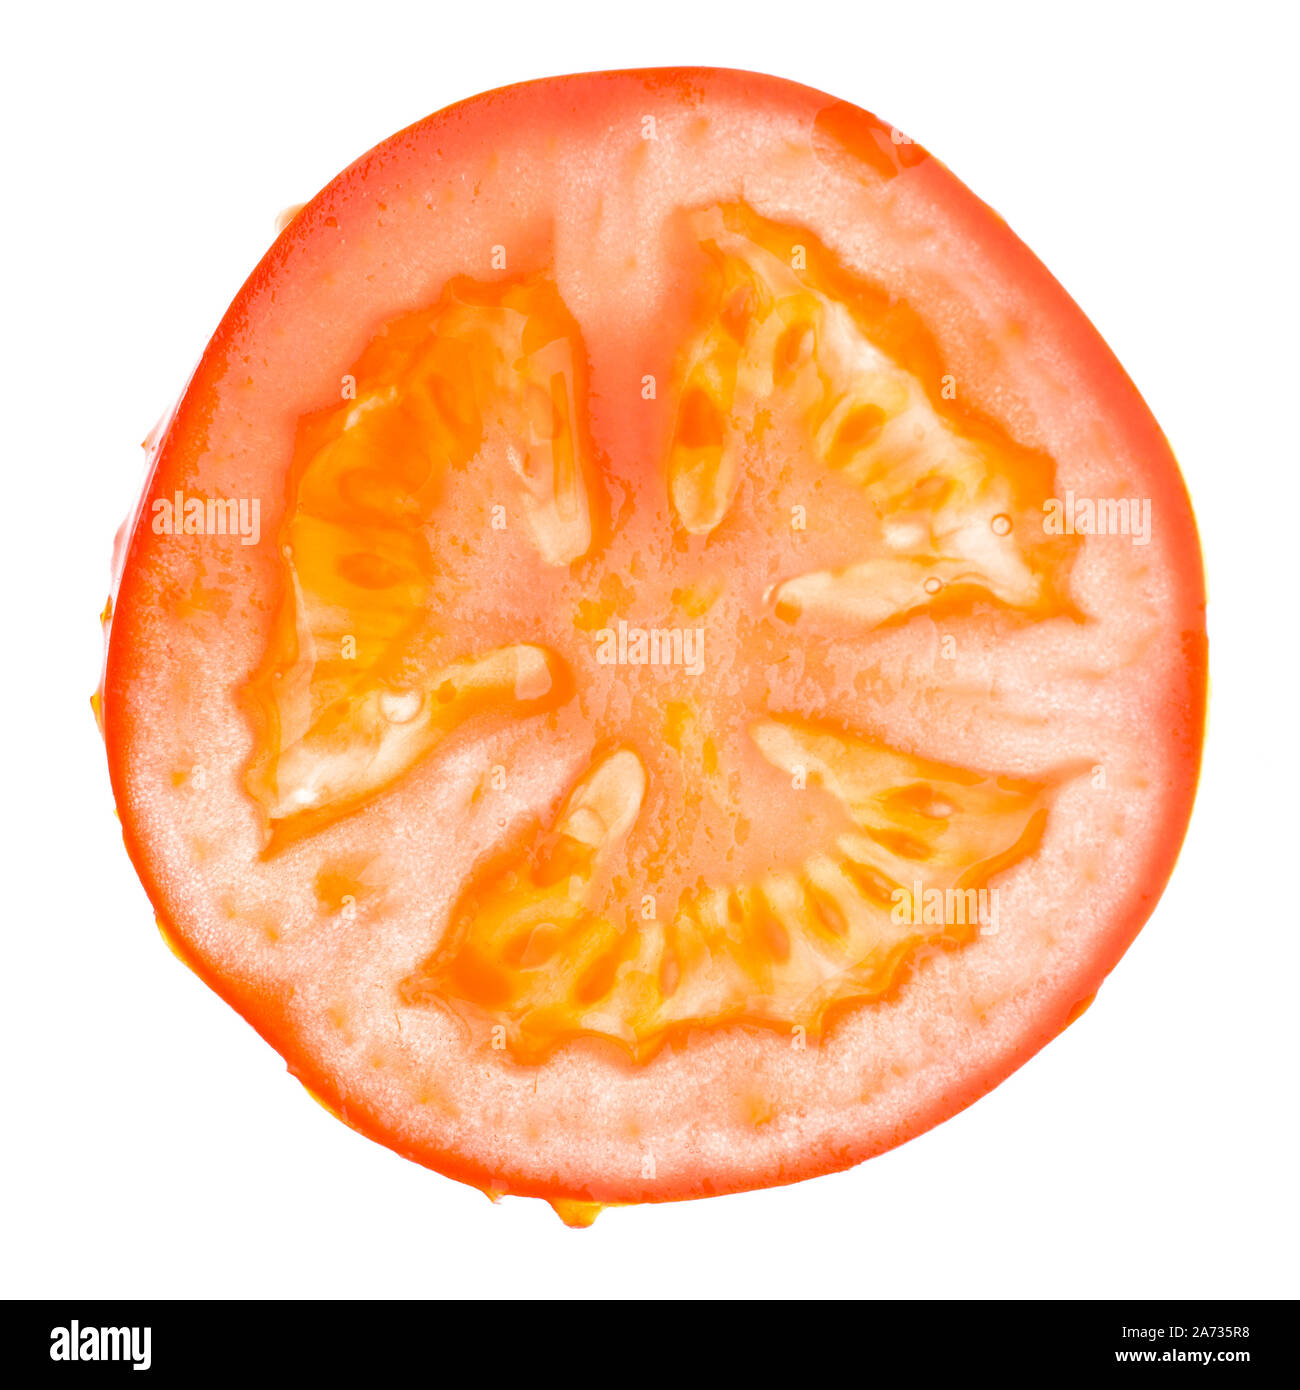 Single slice of a tomato isolated on white background Stock Photo